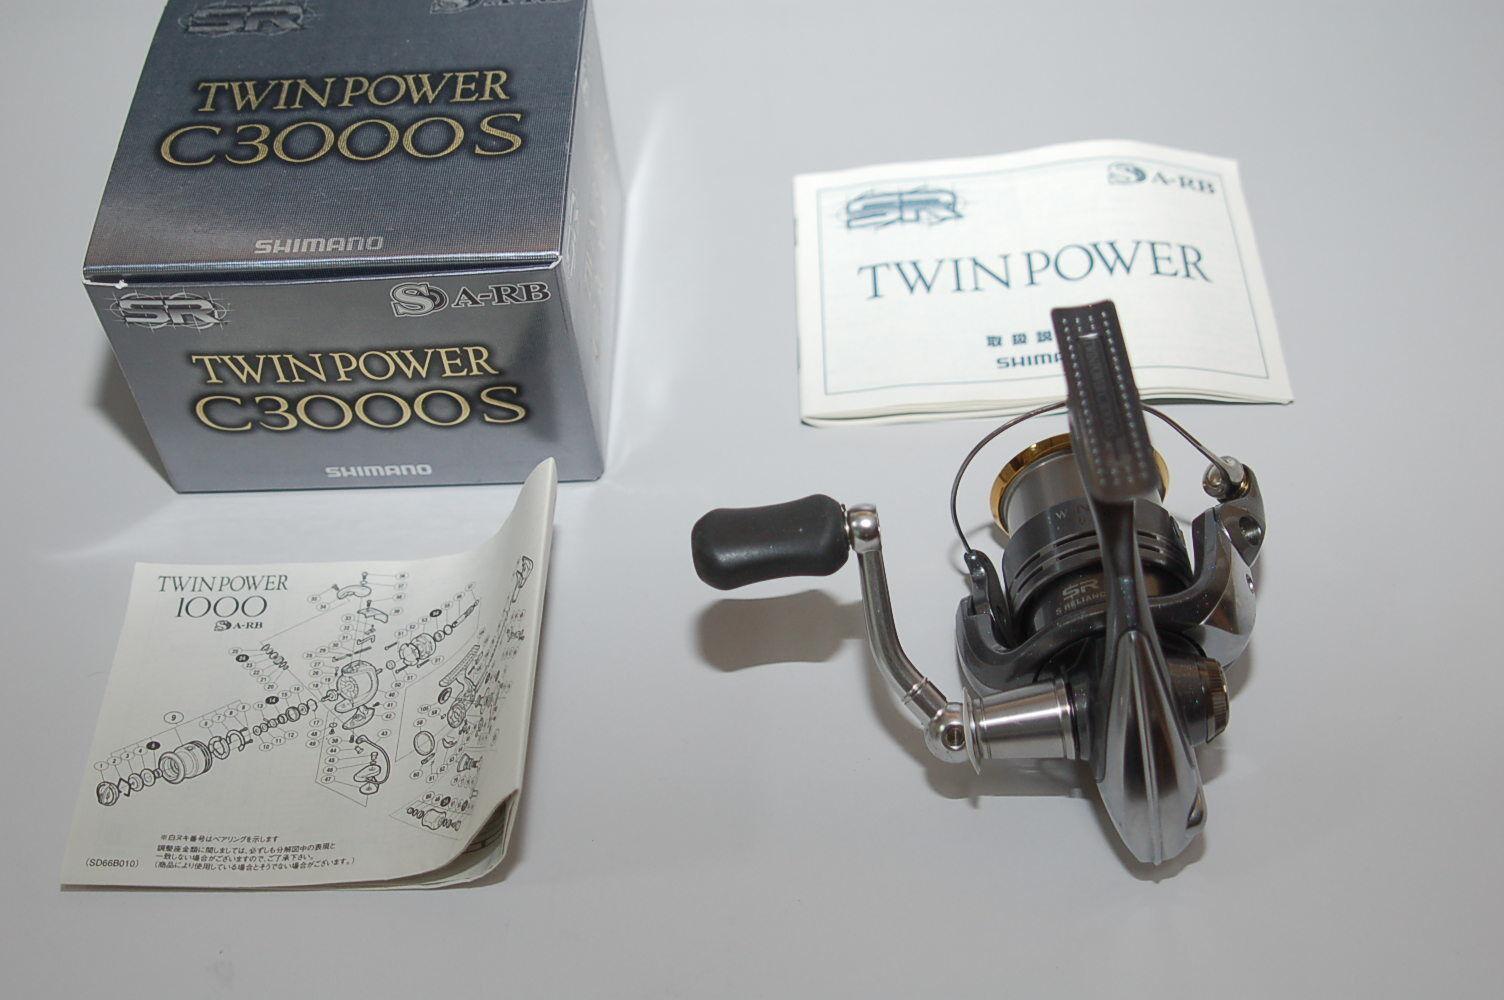 2008 Shimano TwinPower C3000 En Caja